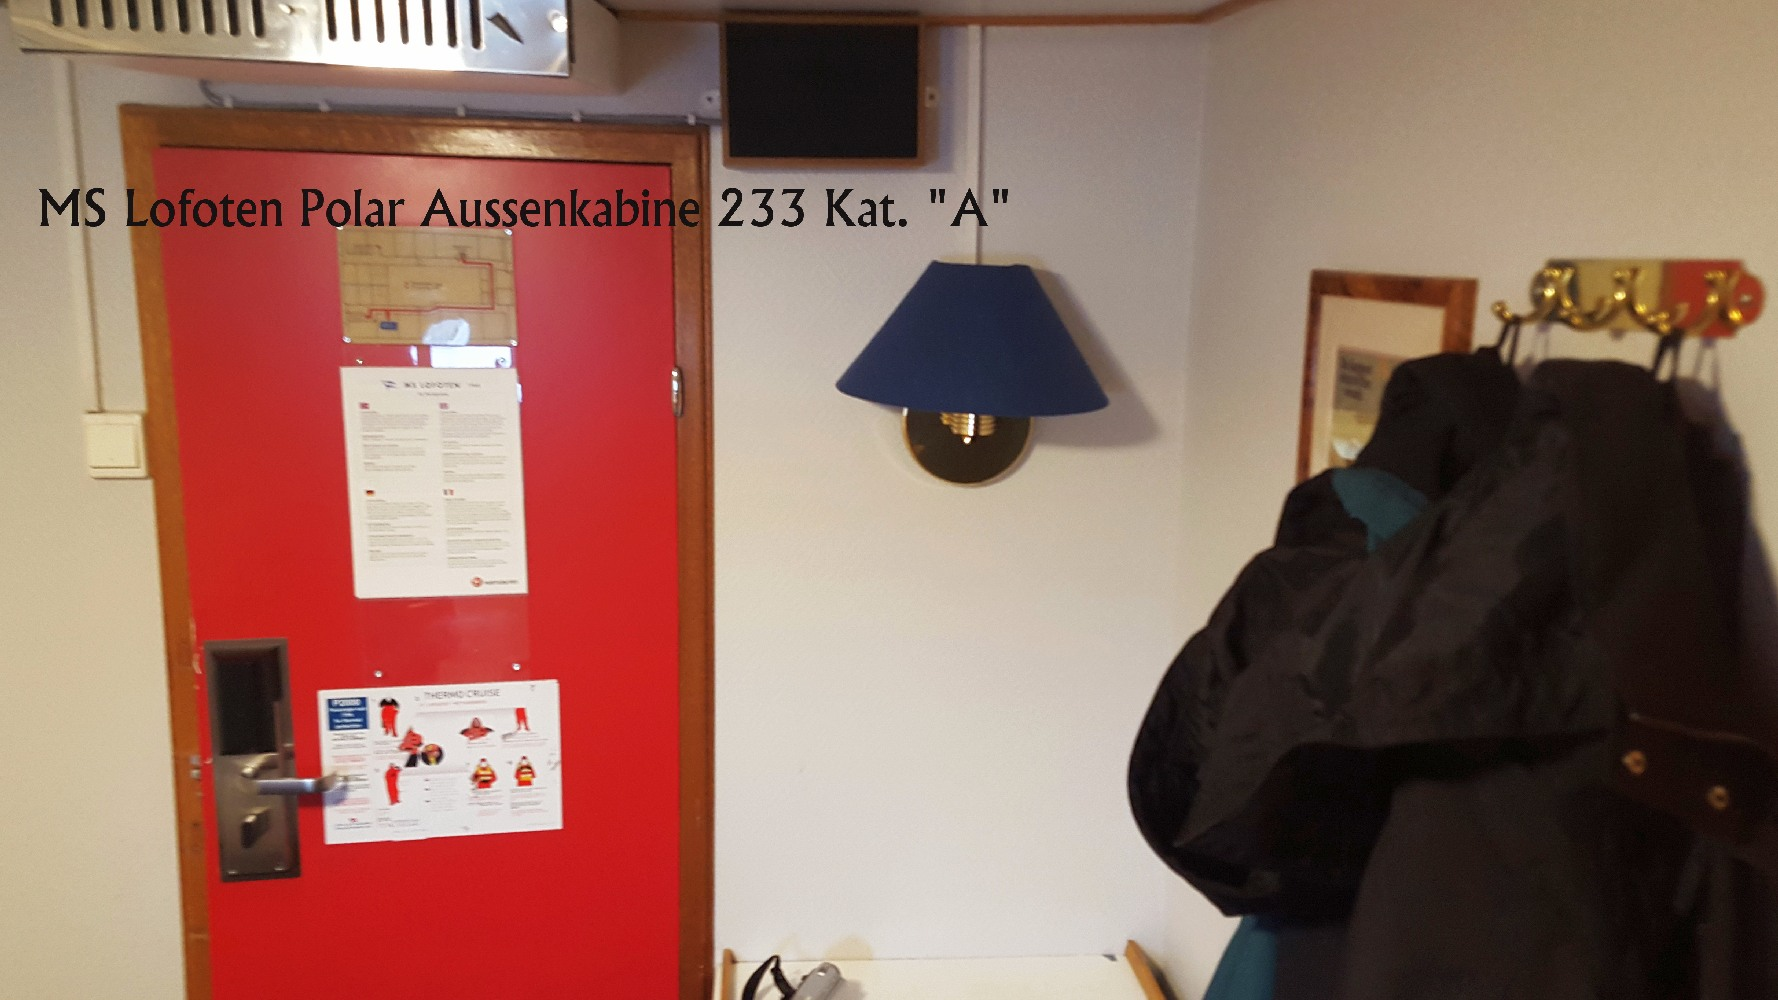 "MS Lofoten Polar Aussenkabine 233 Kat. ""A""  H.Reitz©2014"